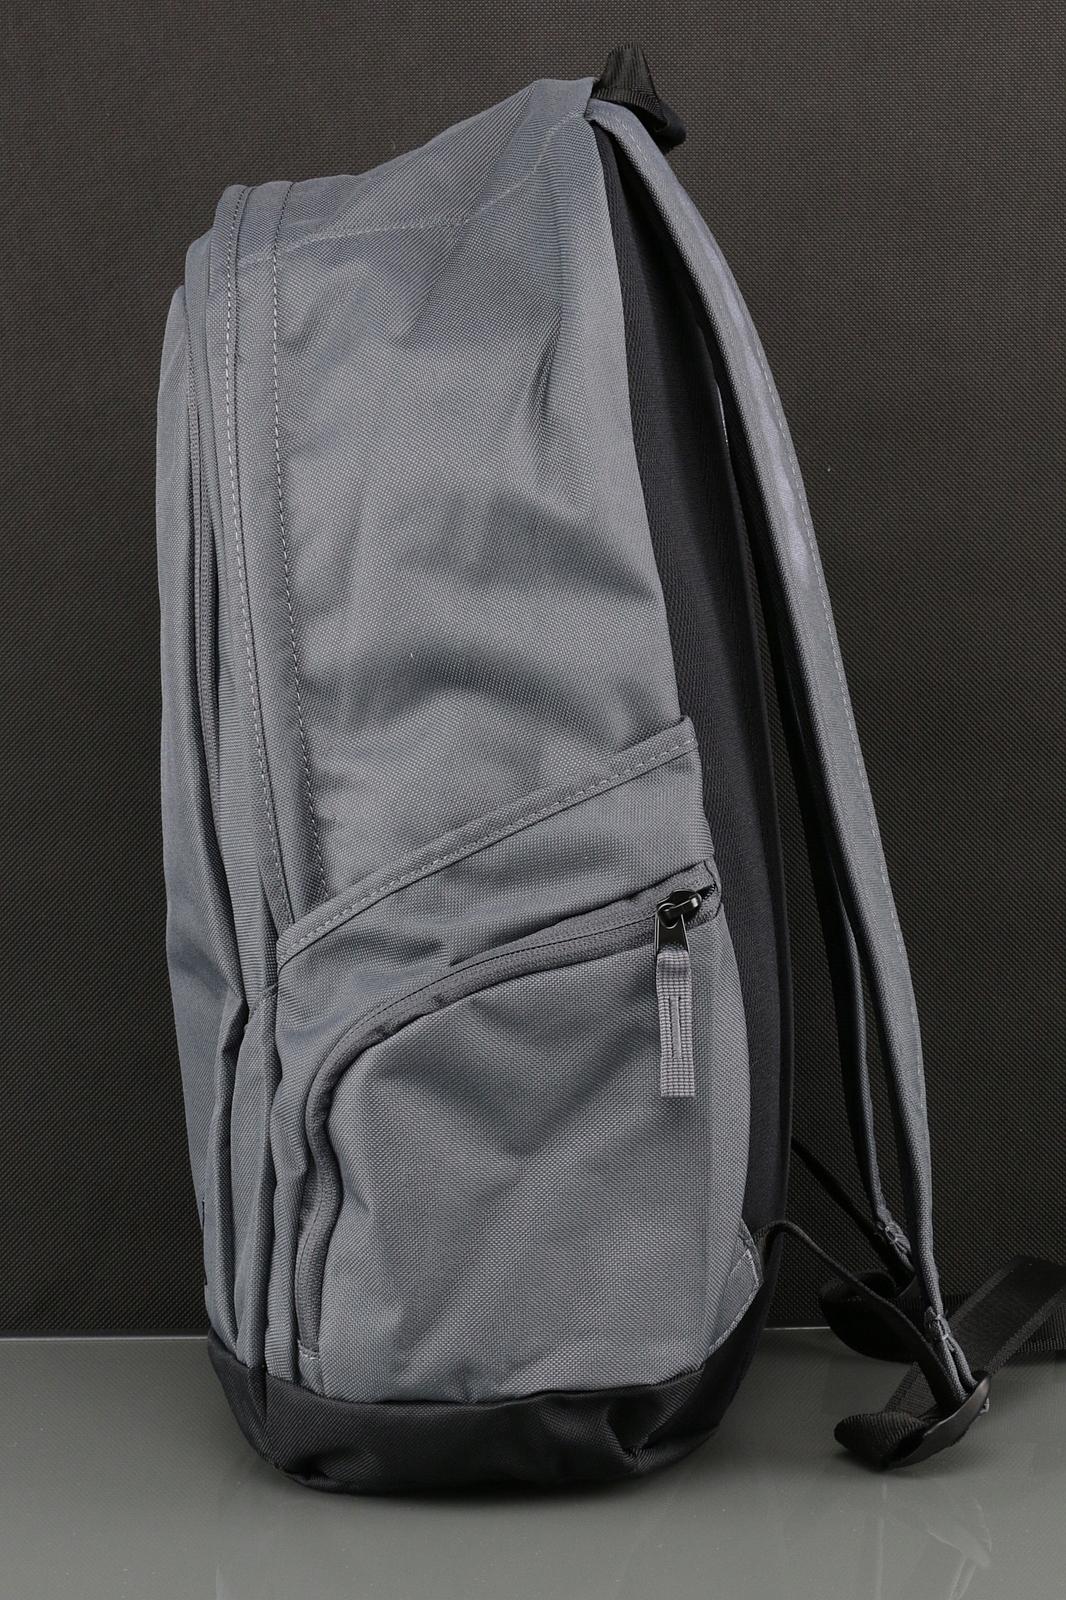 Plecak Nike ALL ACCESS FULLFARE BA4855-021 - 7527070970 - oficjalne ... 6a309fe21fec6